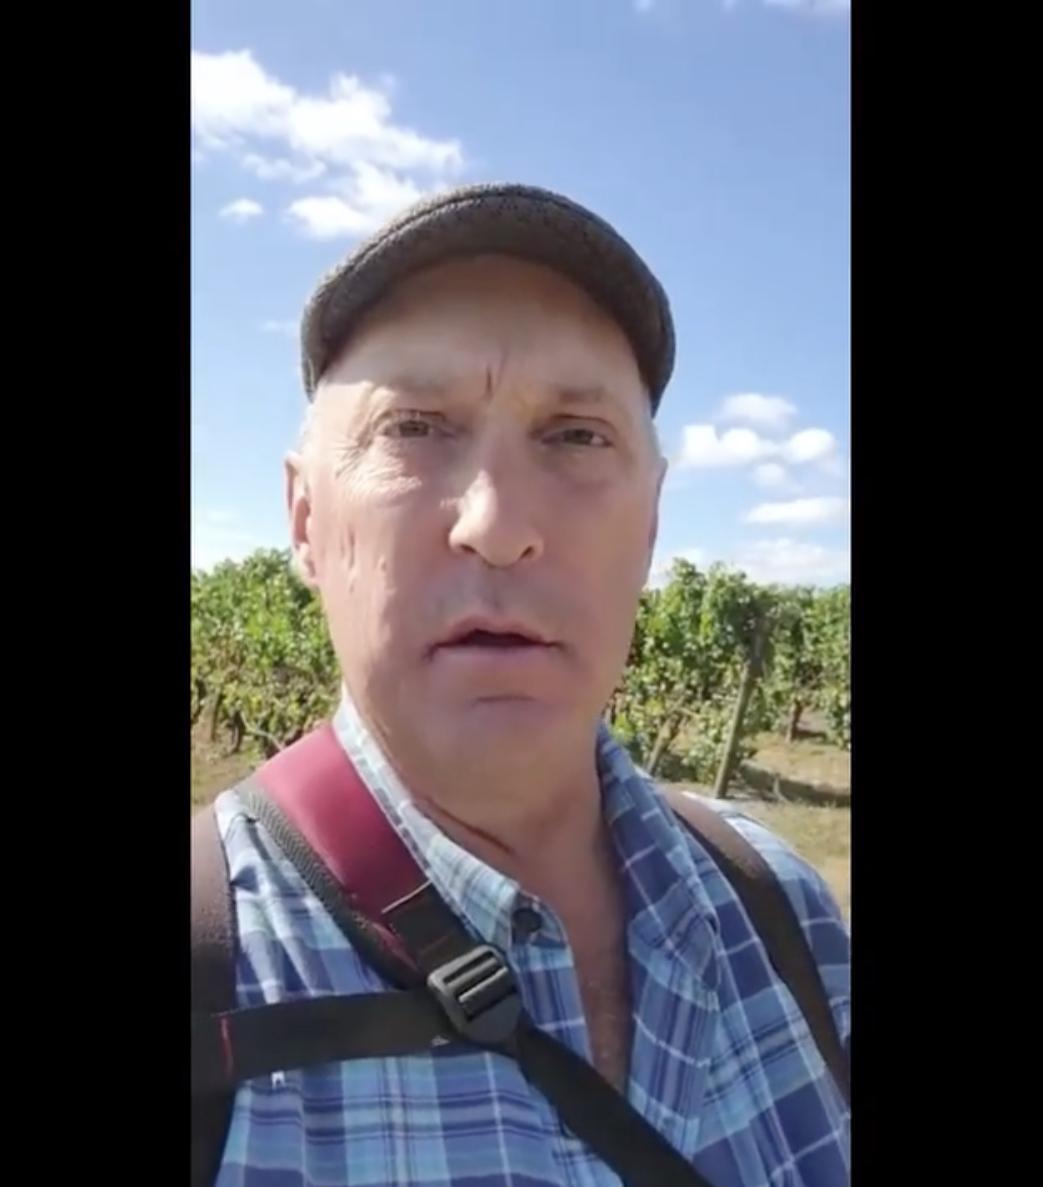 Screenshot of Van Duzer Vineyard Manager Bruce Sonnon in vineyard